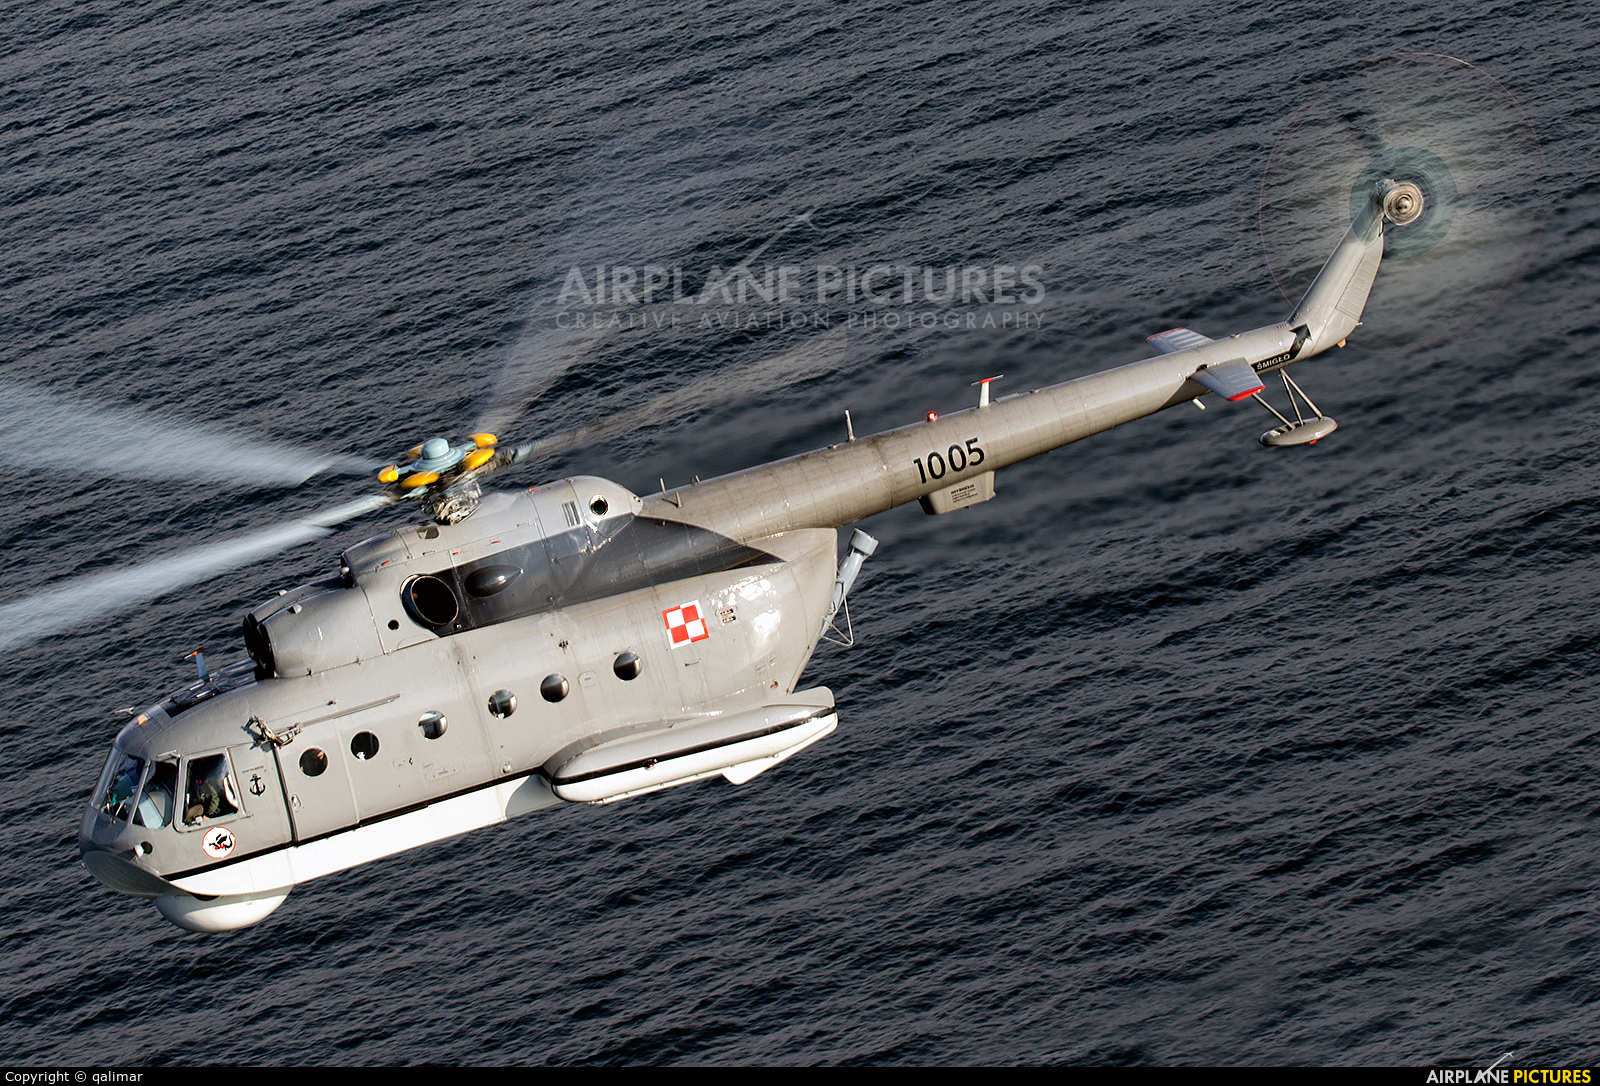 Poland - Navy 1005 aircraft at In Flight - Poland